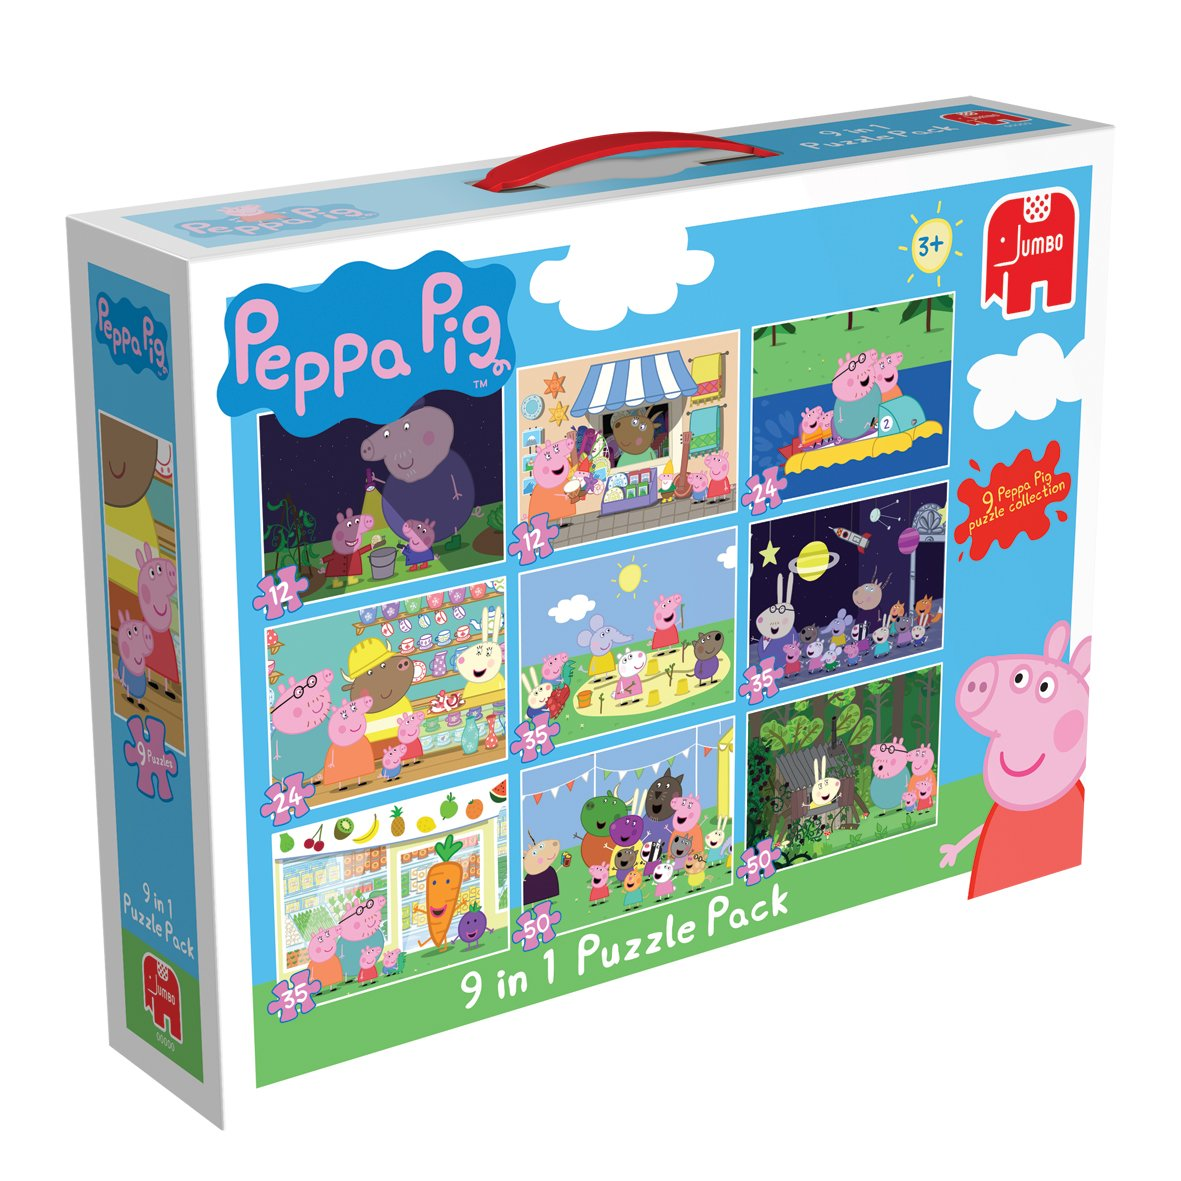 peppa pig 9 in 1 jigsaw puzzle pack jumbo amazon co uk toys u0026 games